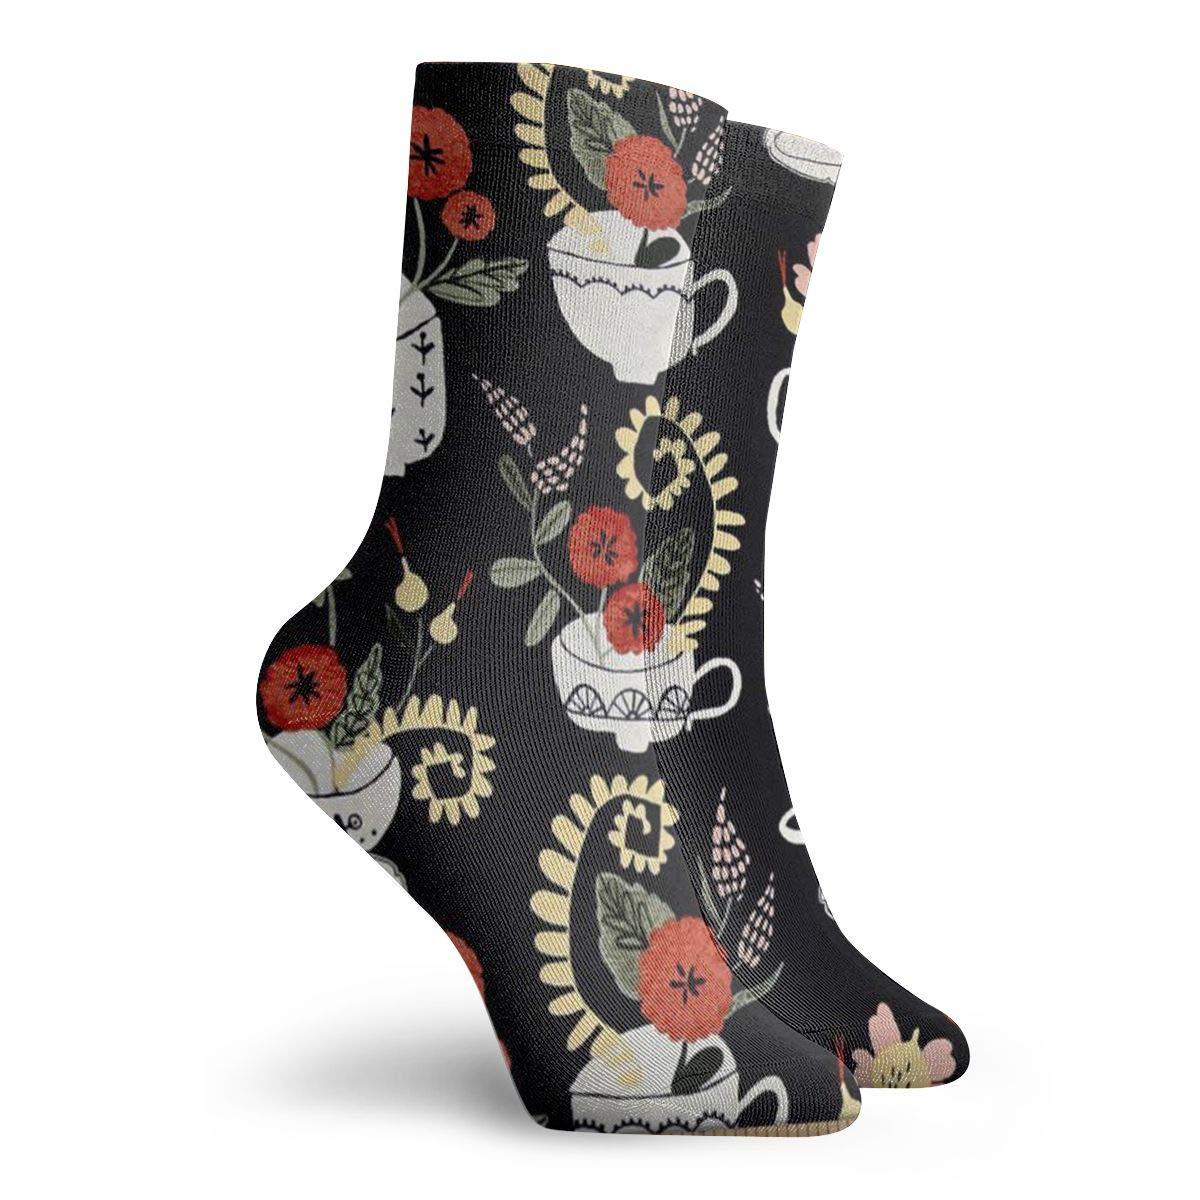 Flower-Plantings Unisex Funny Casual Crew Socks Athletic Socks For Boys Girls Kids Teenagers